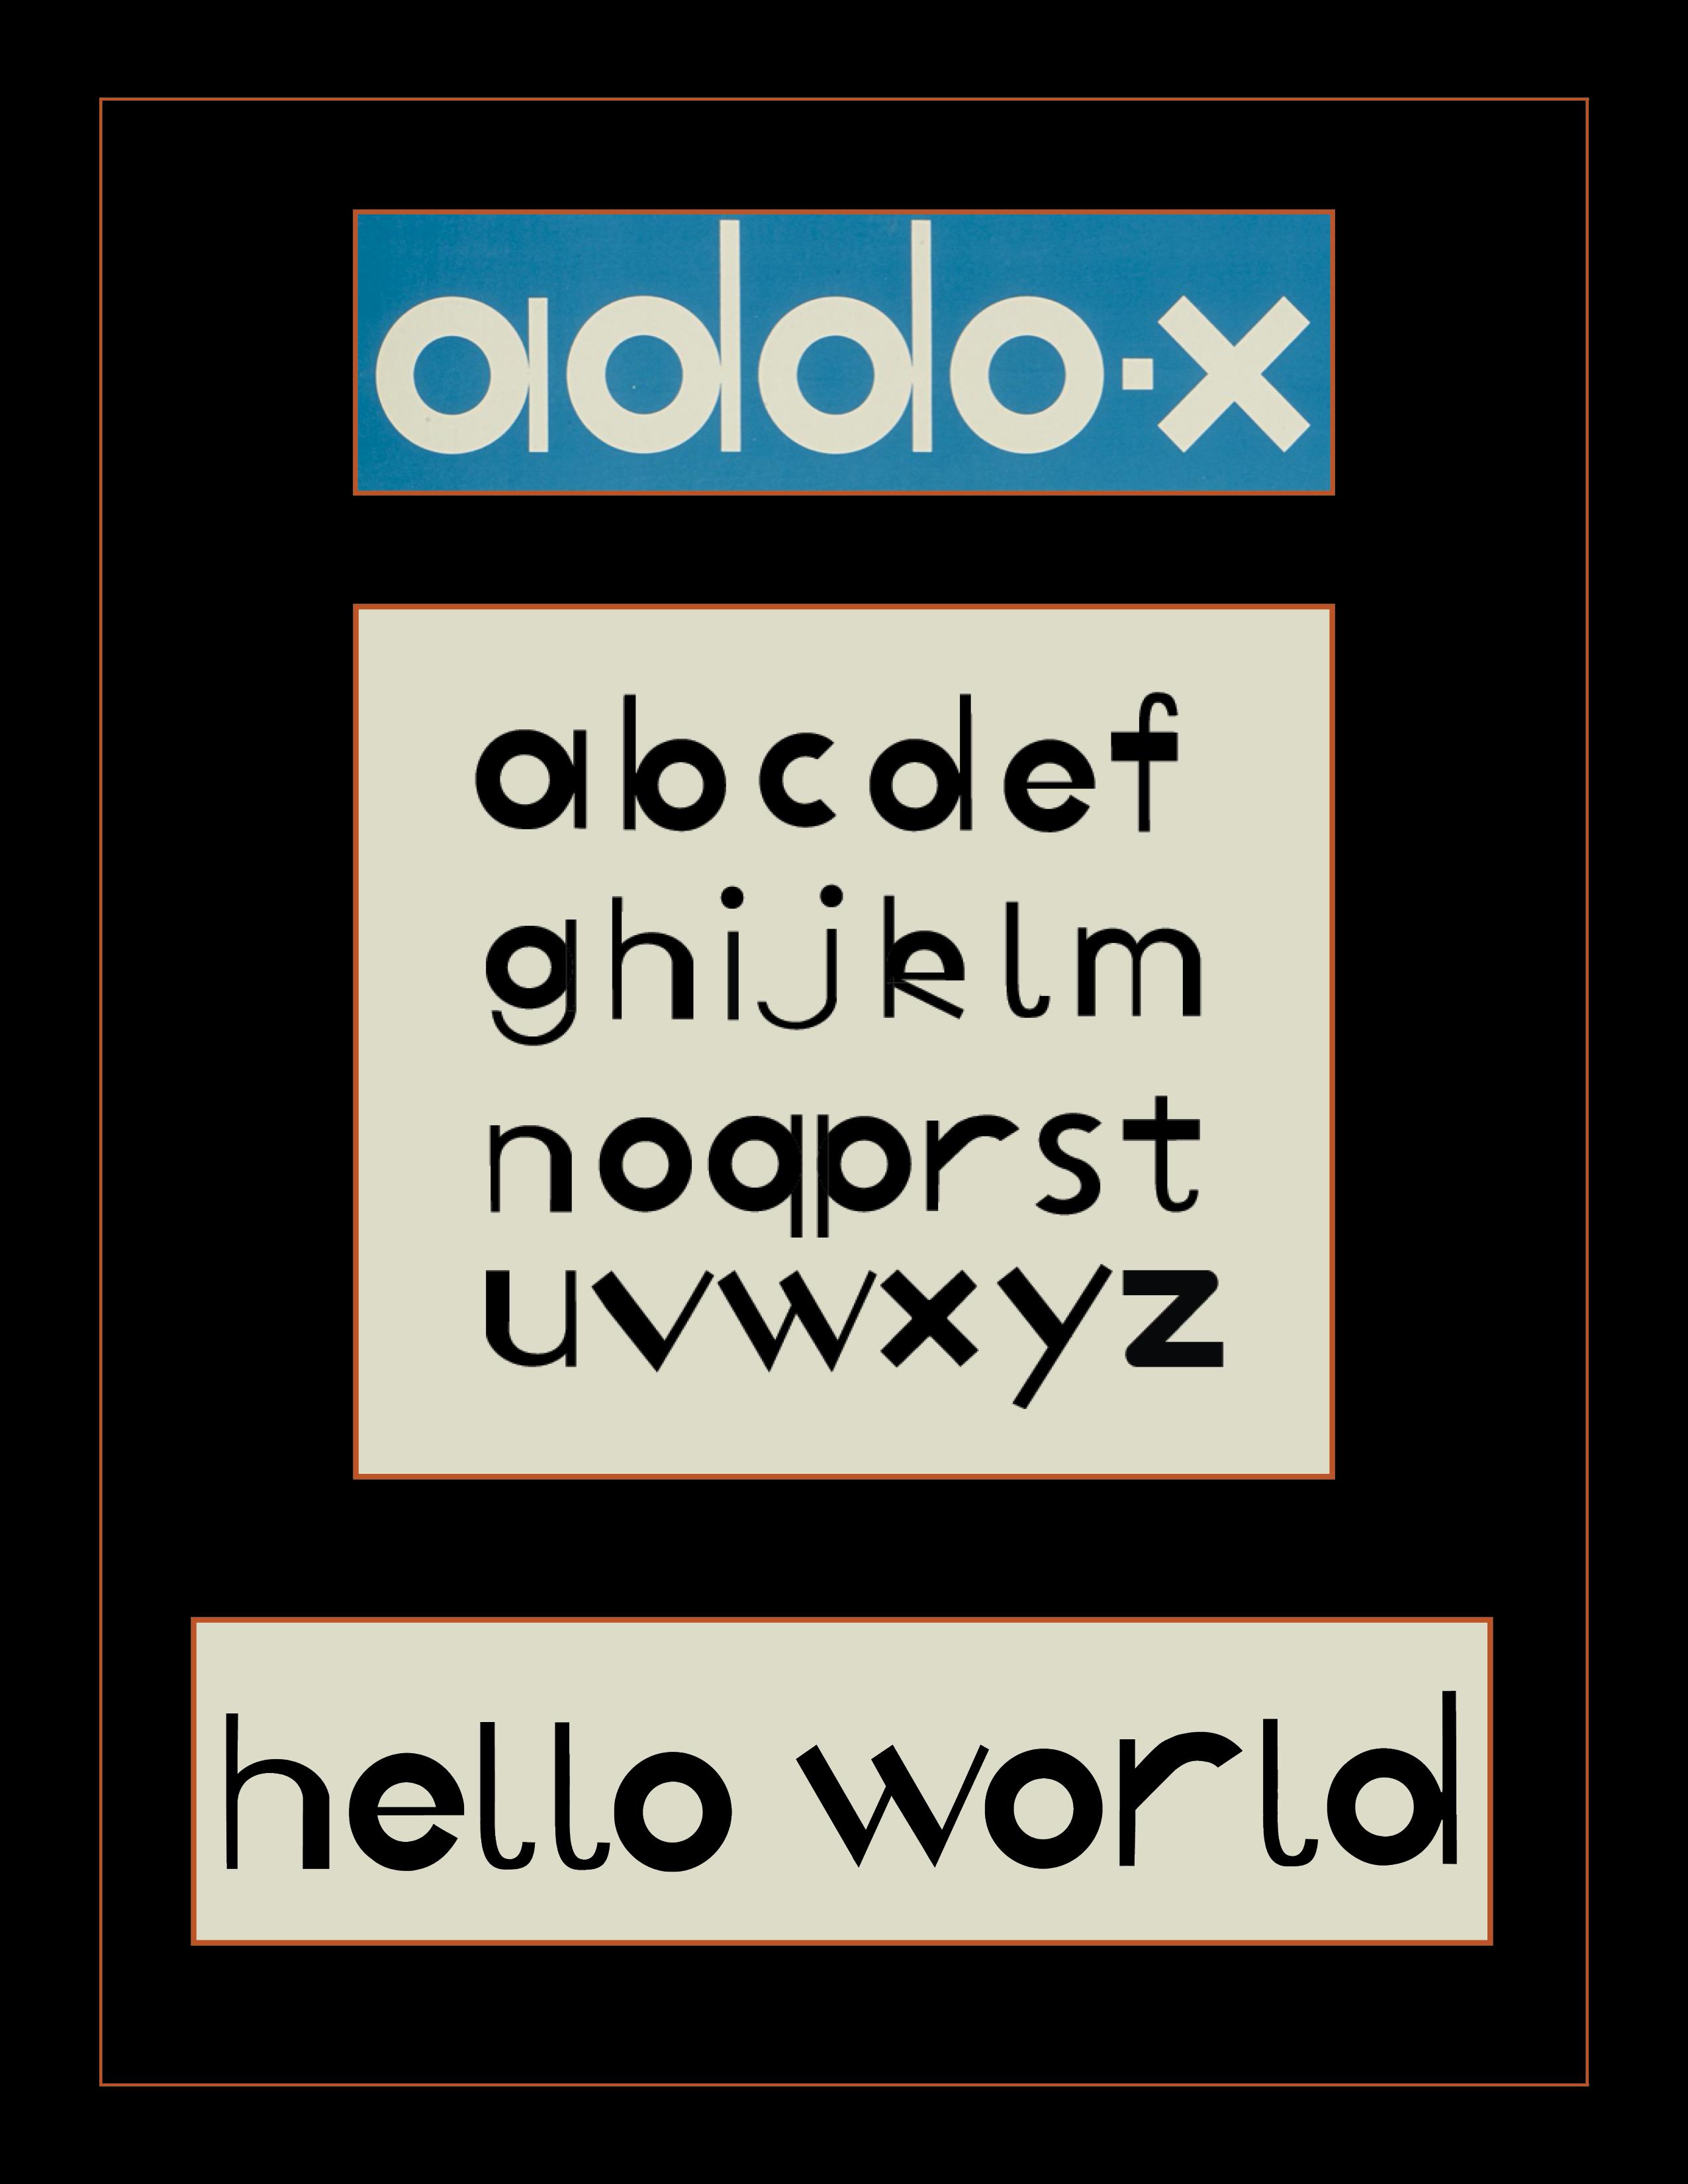 type design inspired by ladislav sutnar